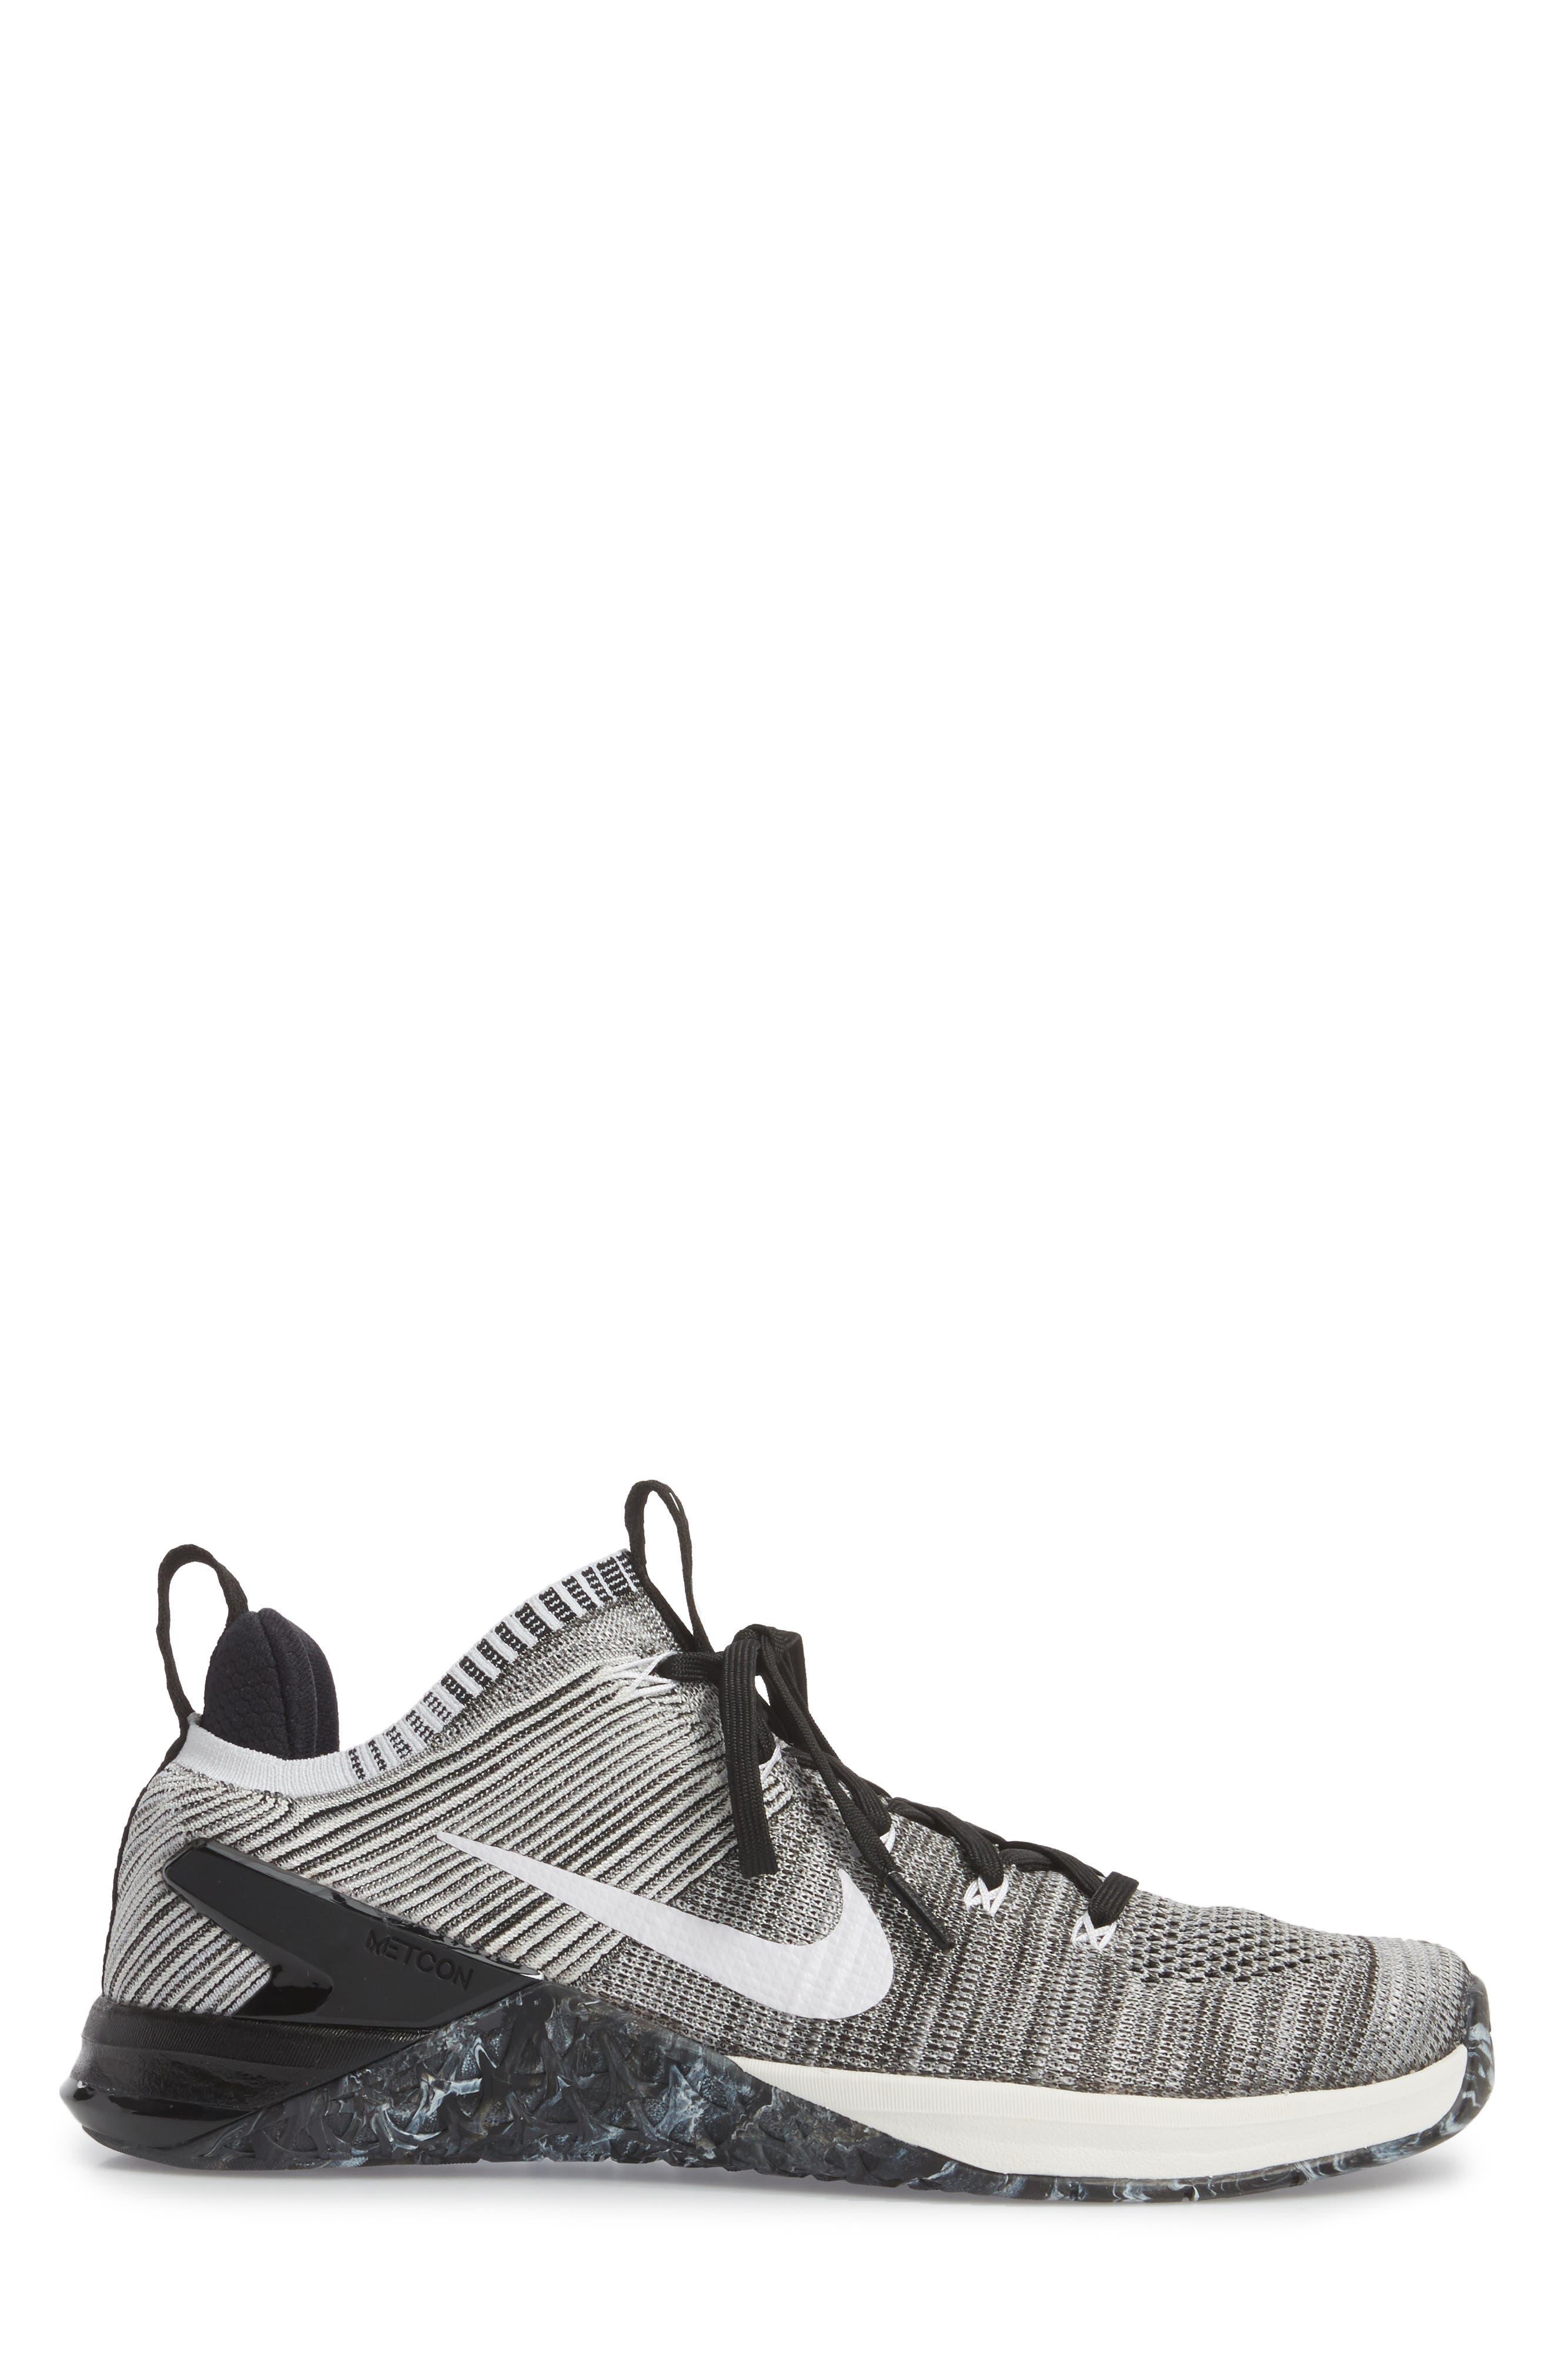 Alternate Image 3  - Nike Metcon DSX Flyknit 2 Training Shoe (Men)